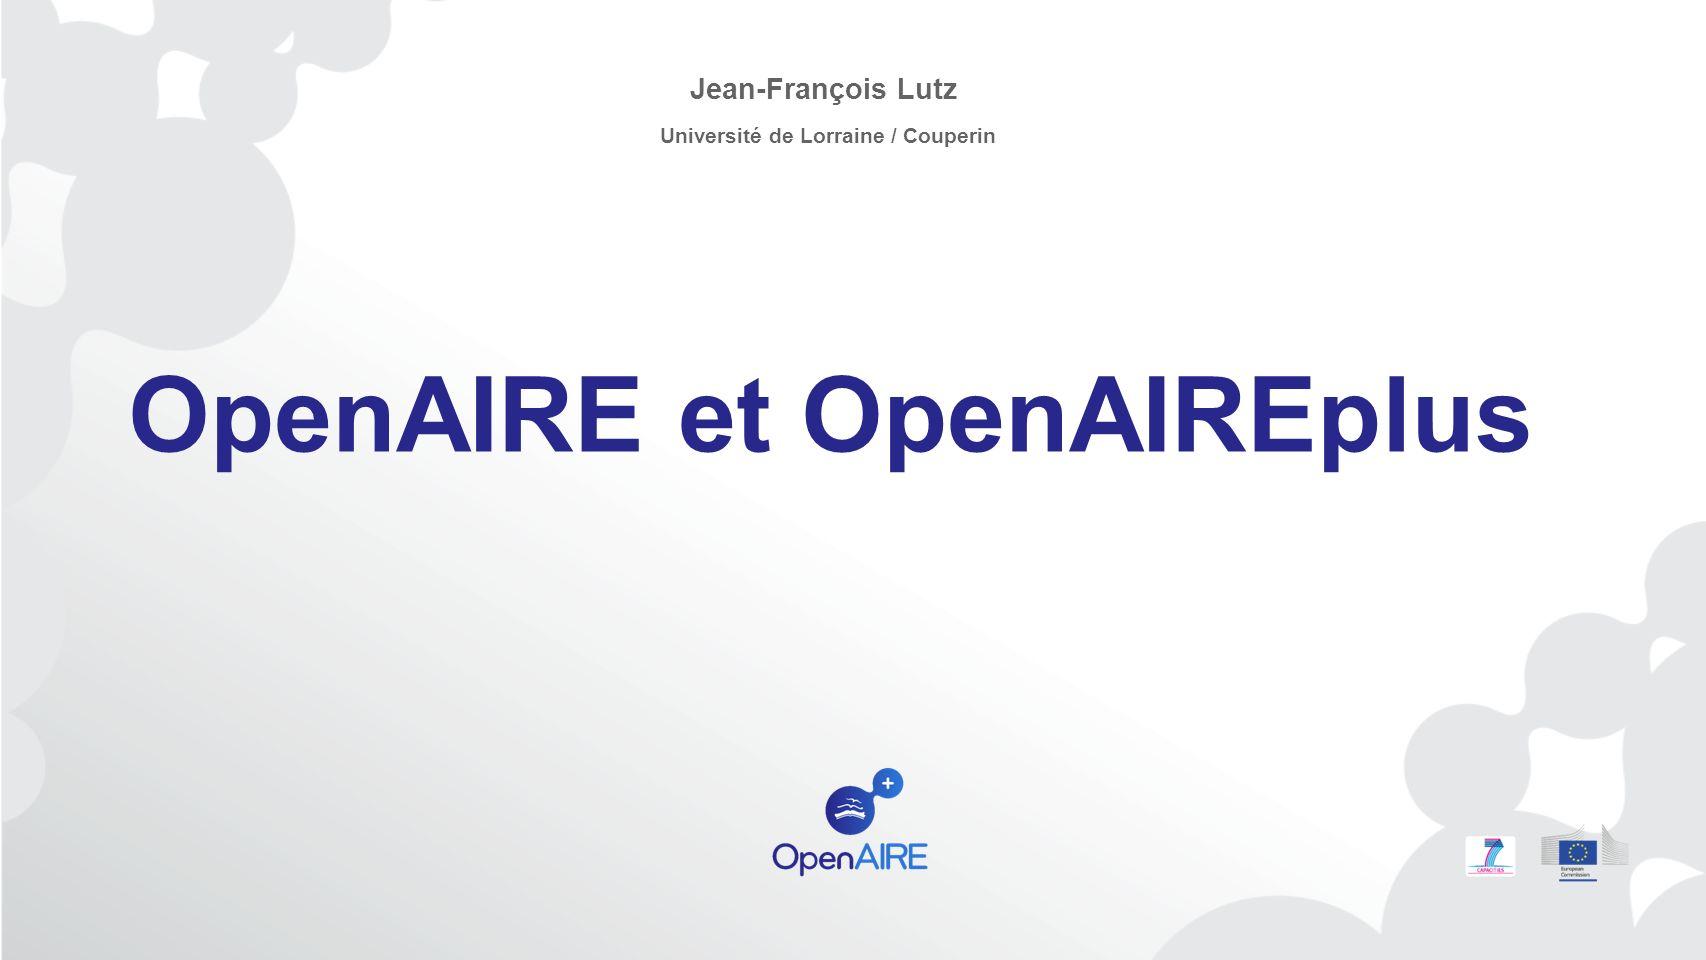 OpenAIRE et OpenAIREplus